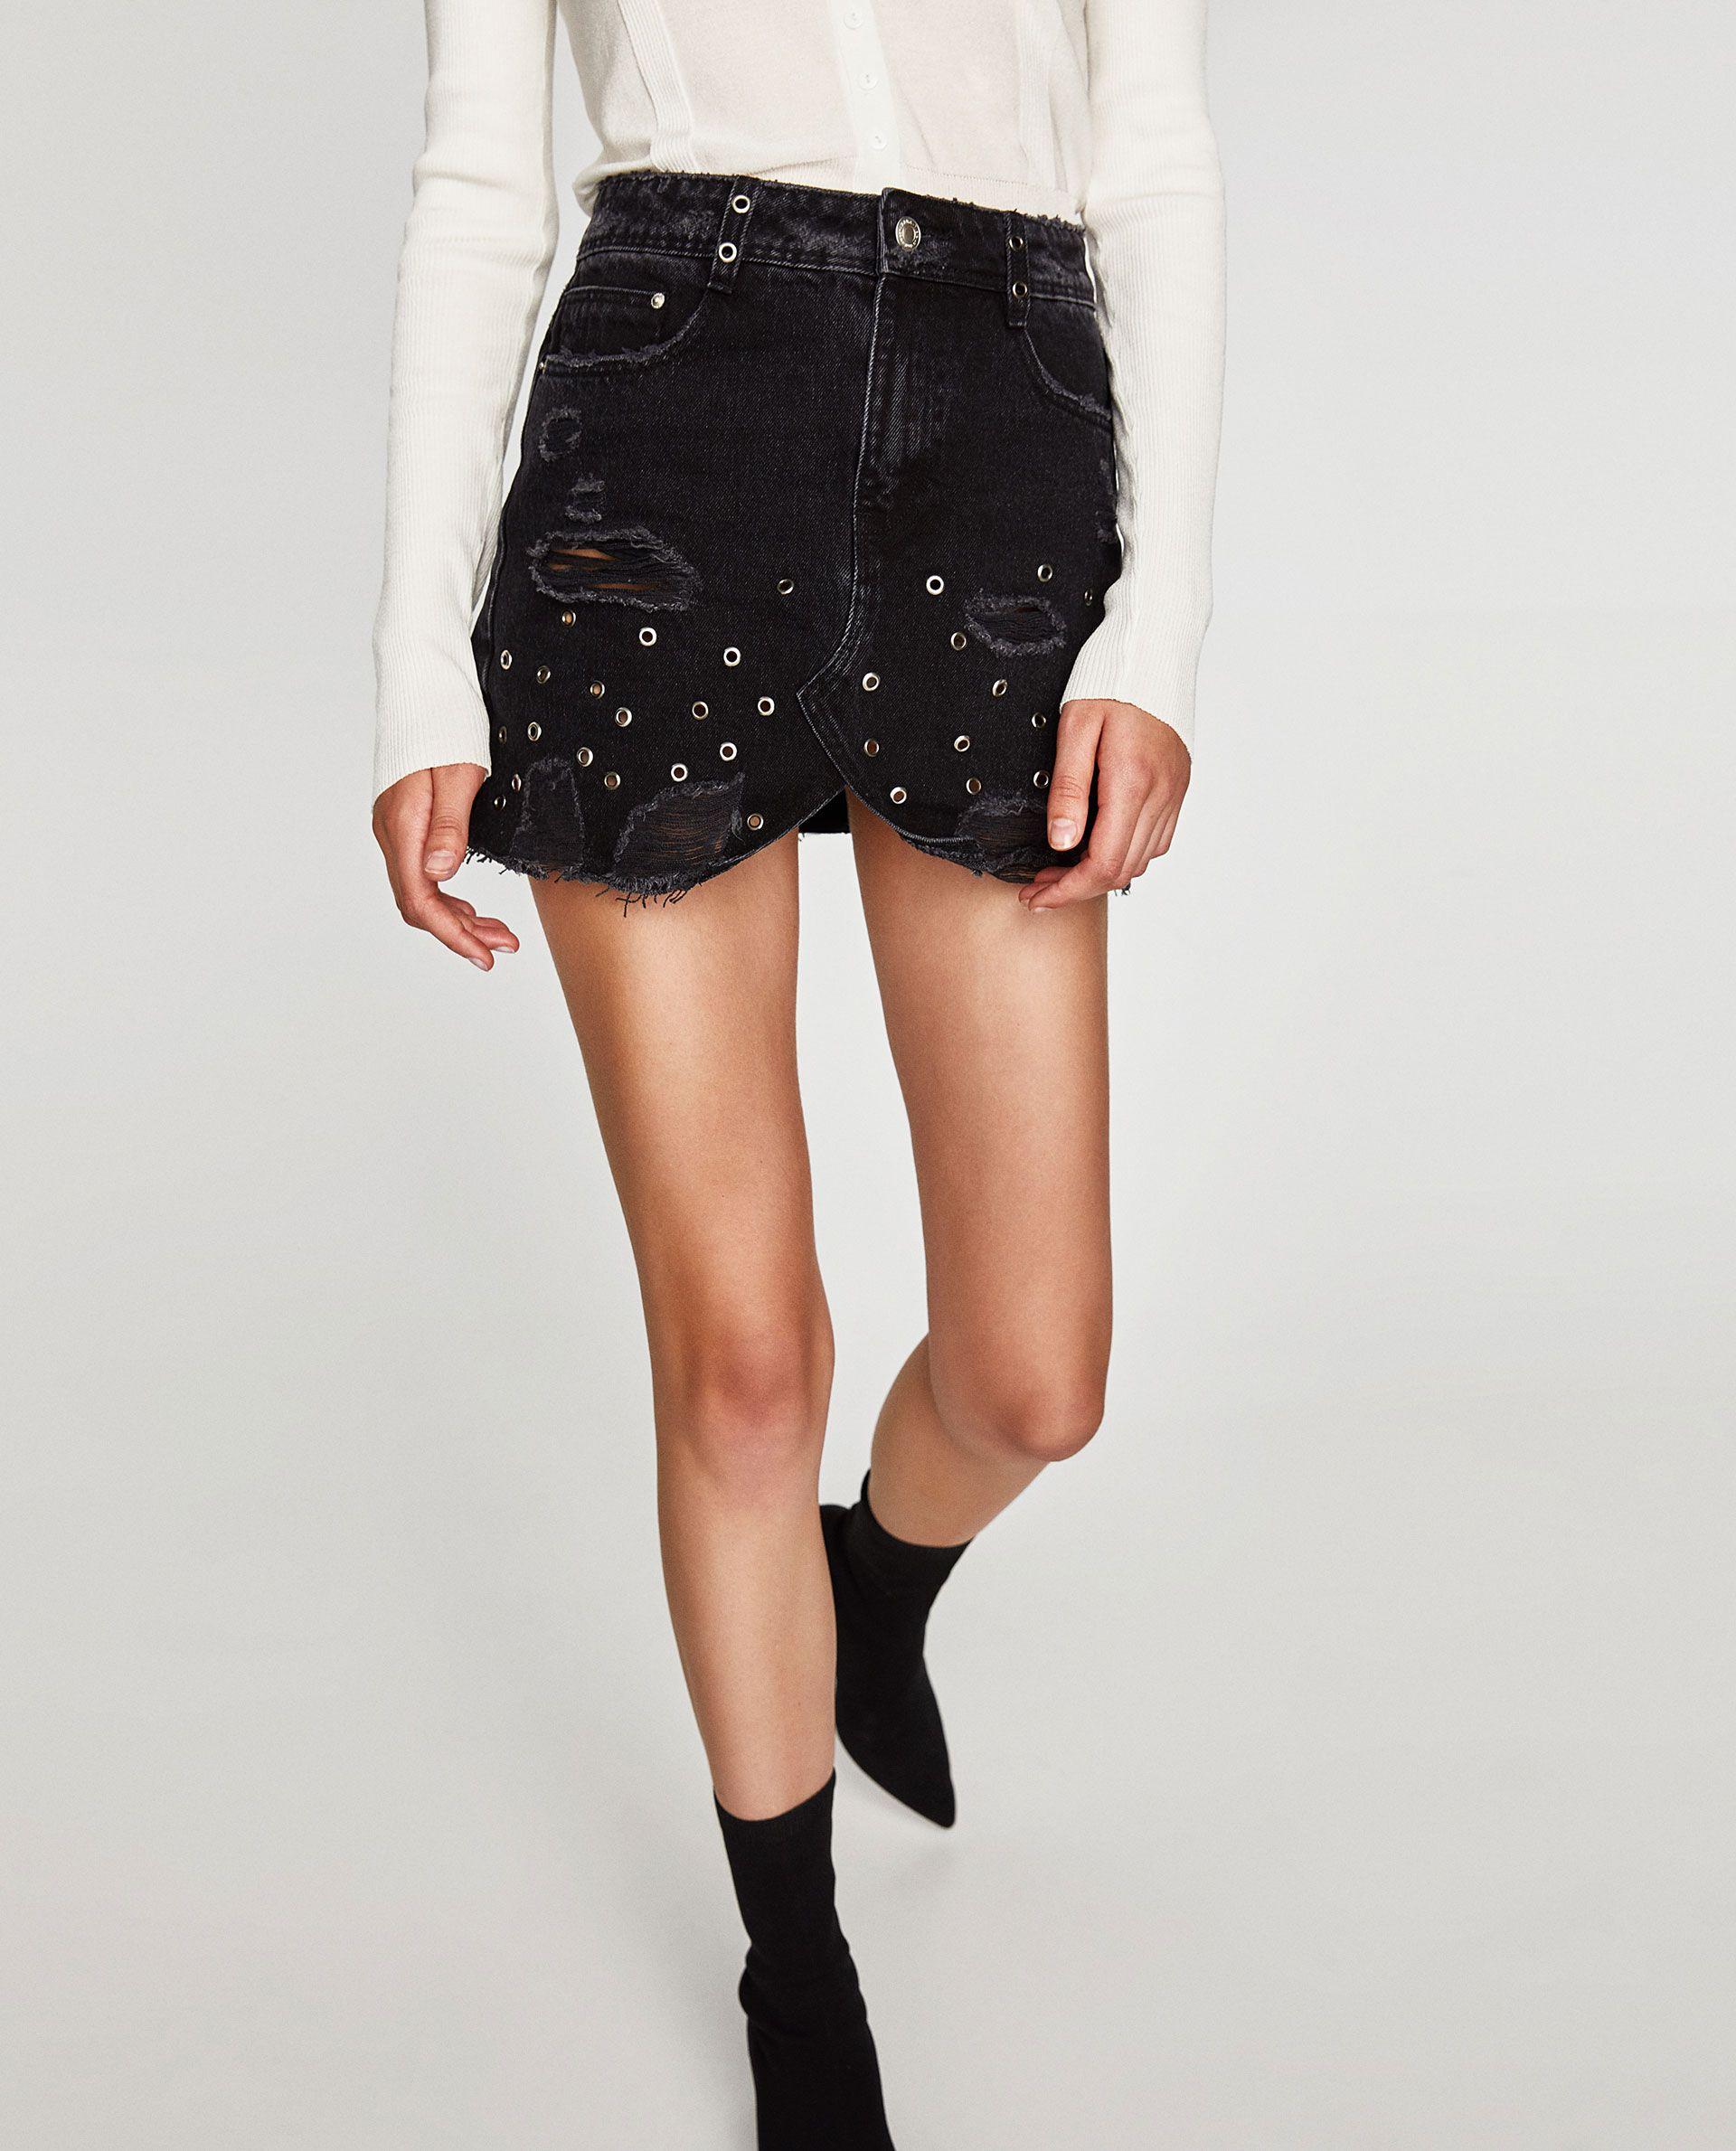 kahai-demin-skirt-small-my-aunt-is-so-hot